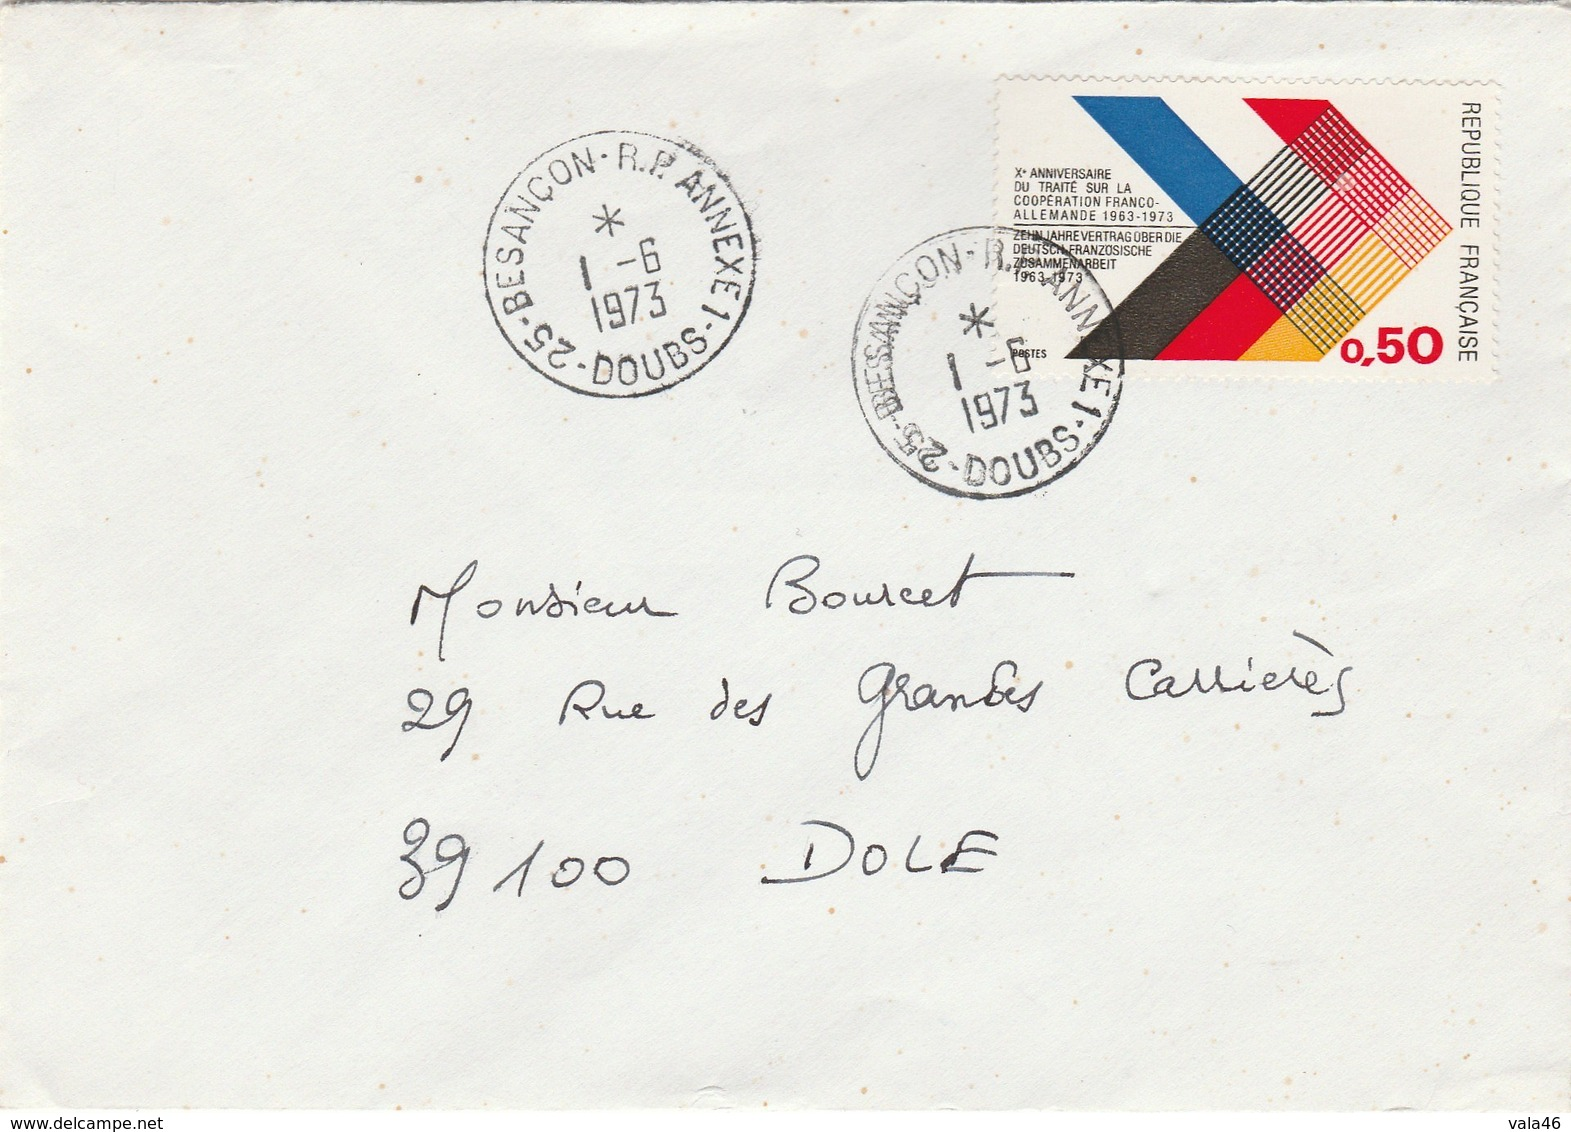 BESANCON  25 DOUBS  CACHET BESANCON RP  ANNEXE 1 - Postmark Collection (Covers)